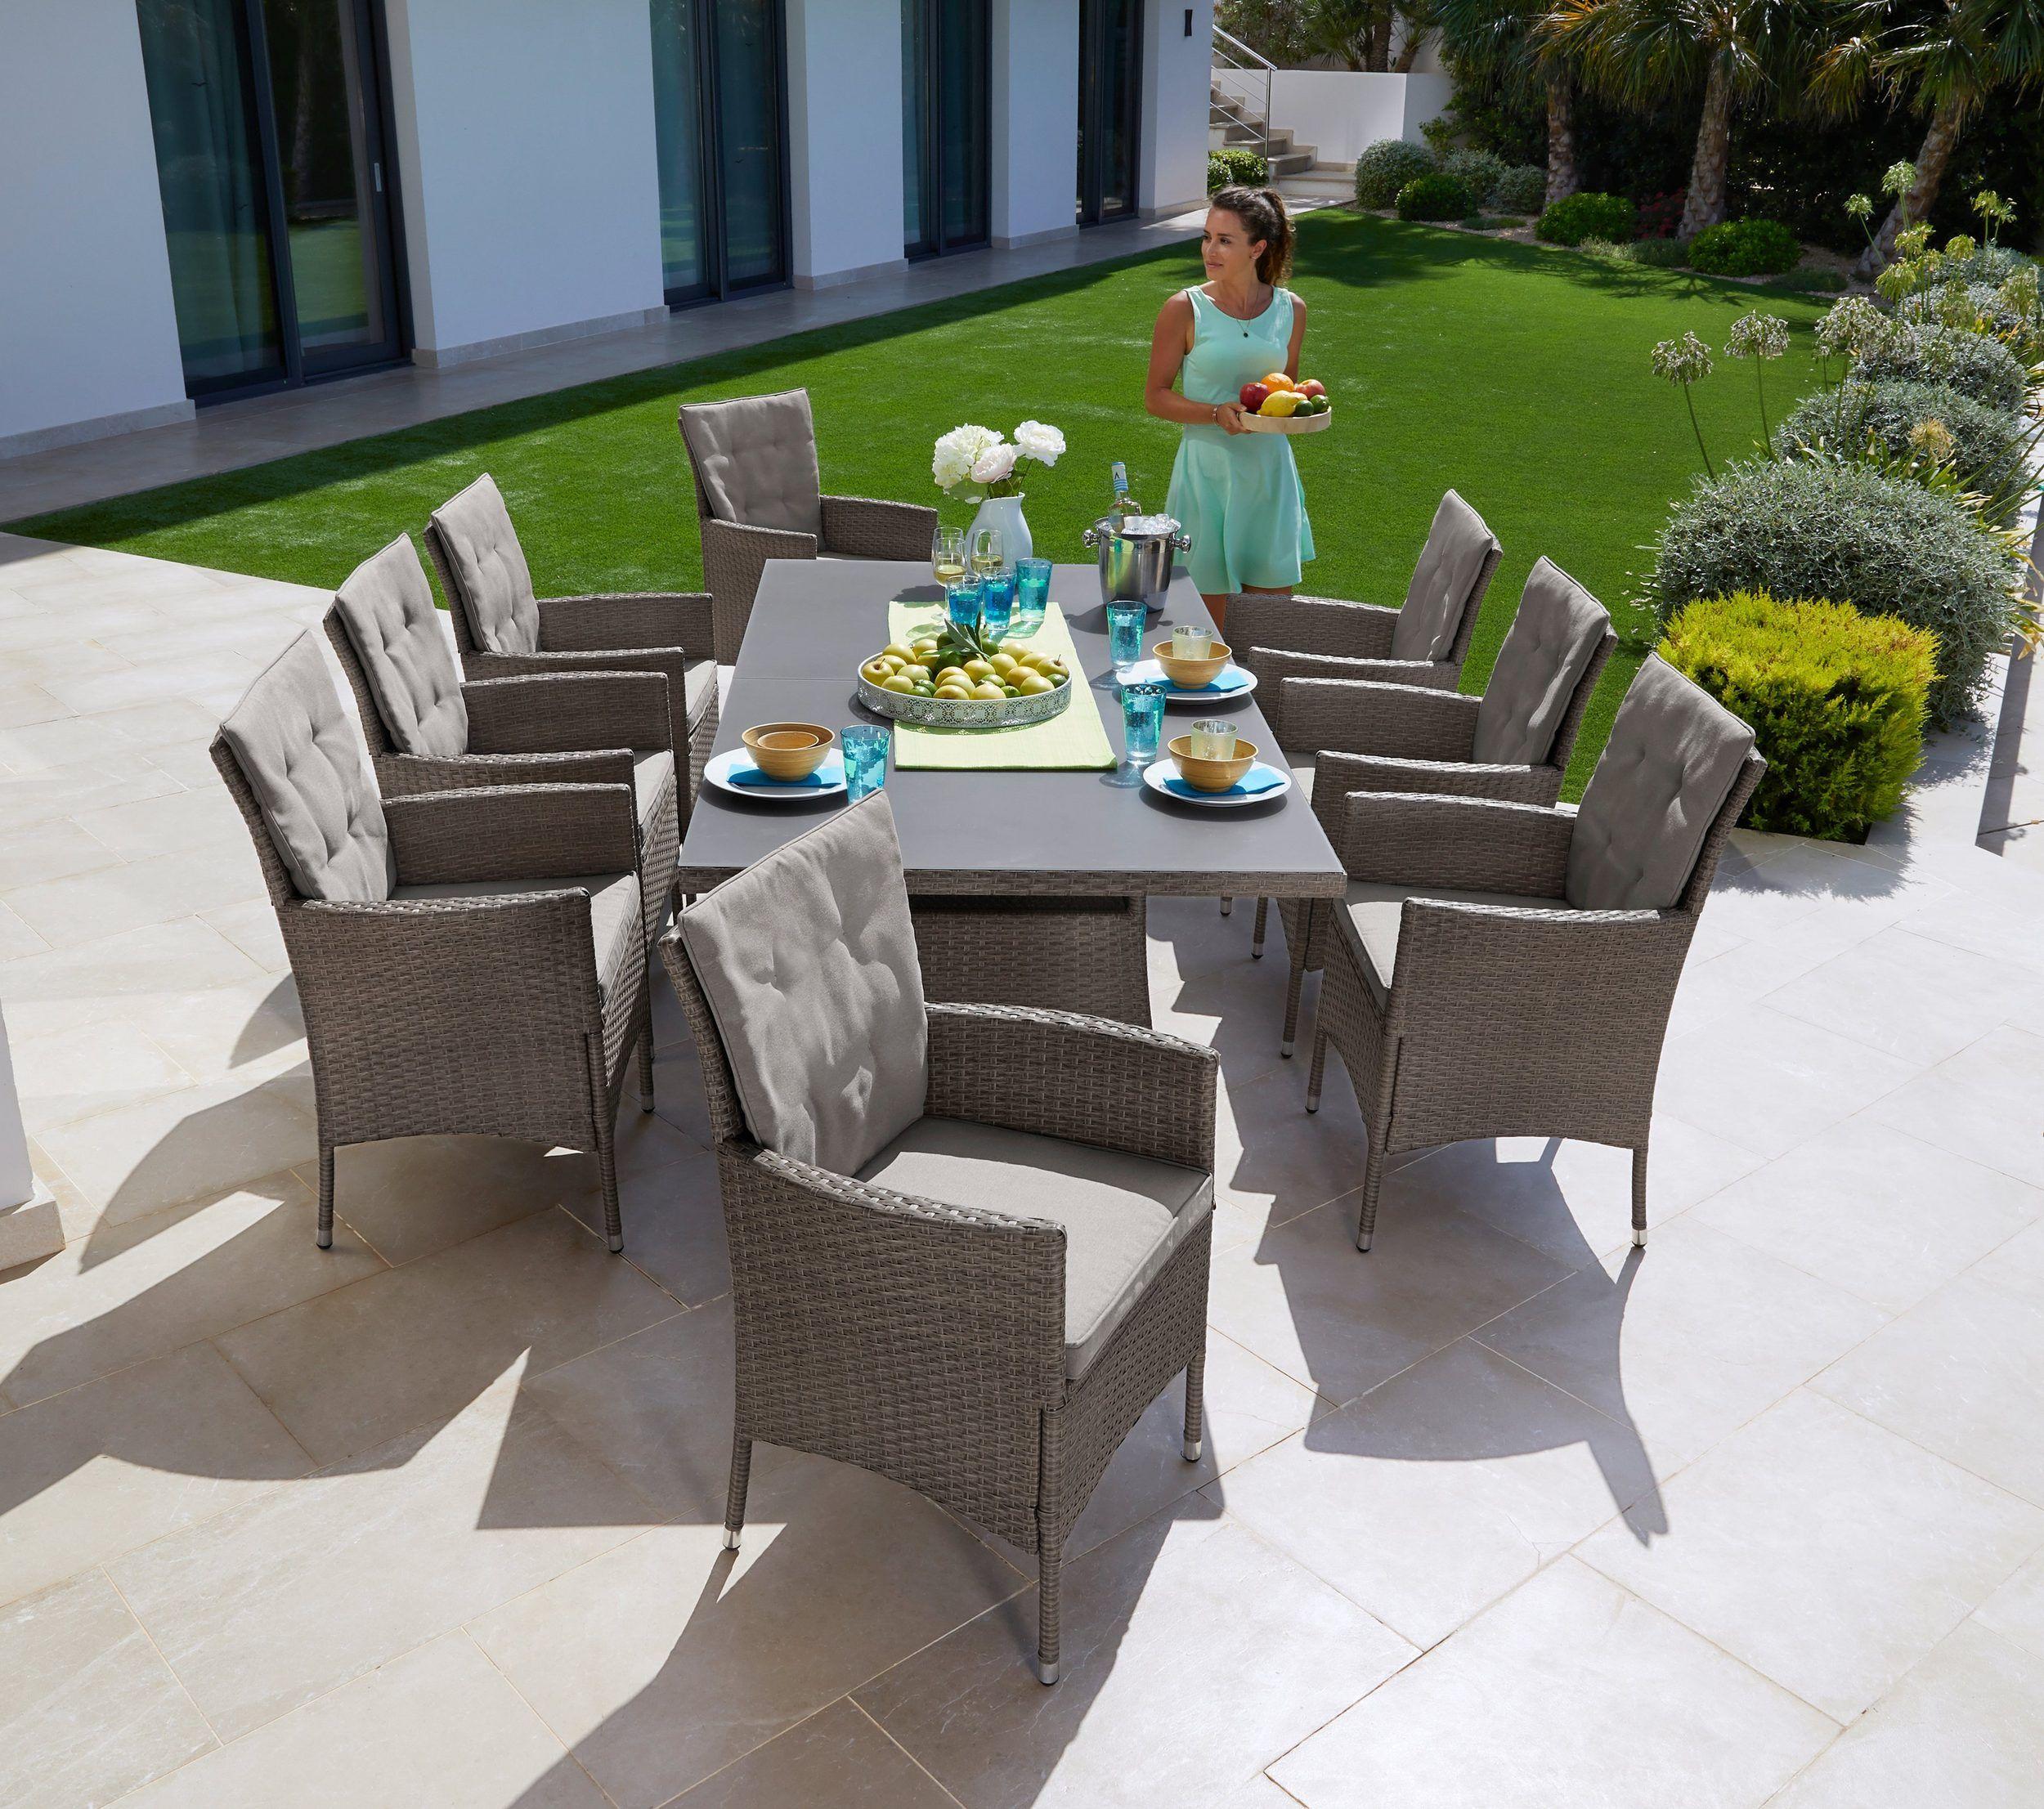 Konifera Gartenmobelset Mailand Diningset Fur 8 Personen Geeignet Online Kaufen Otto Gartenmobel Sets Terassenideen Gartenmobel